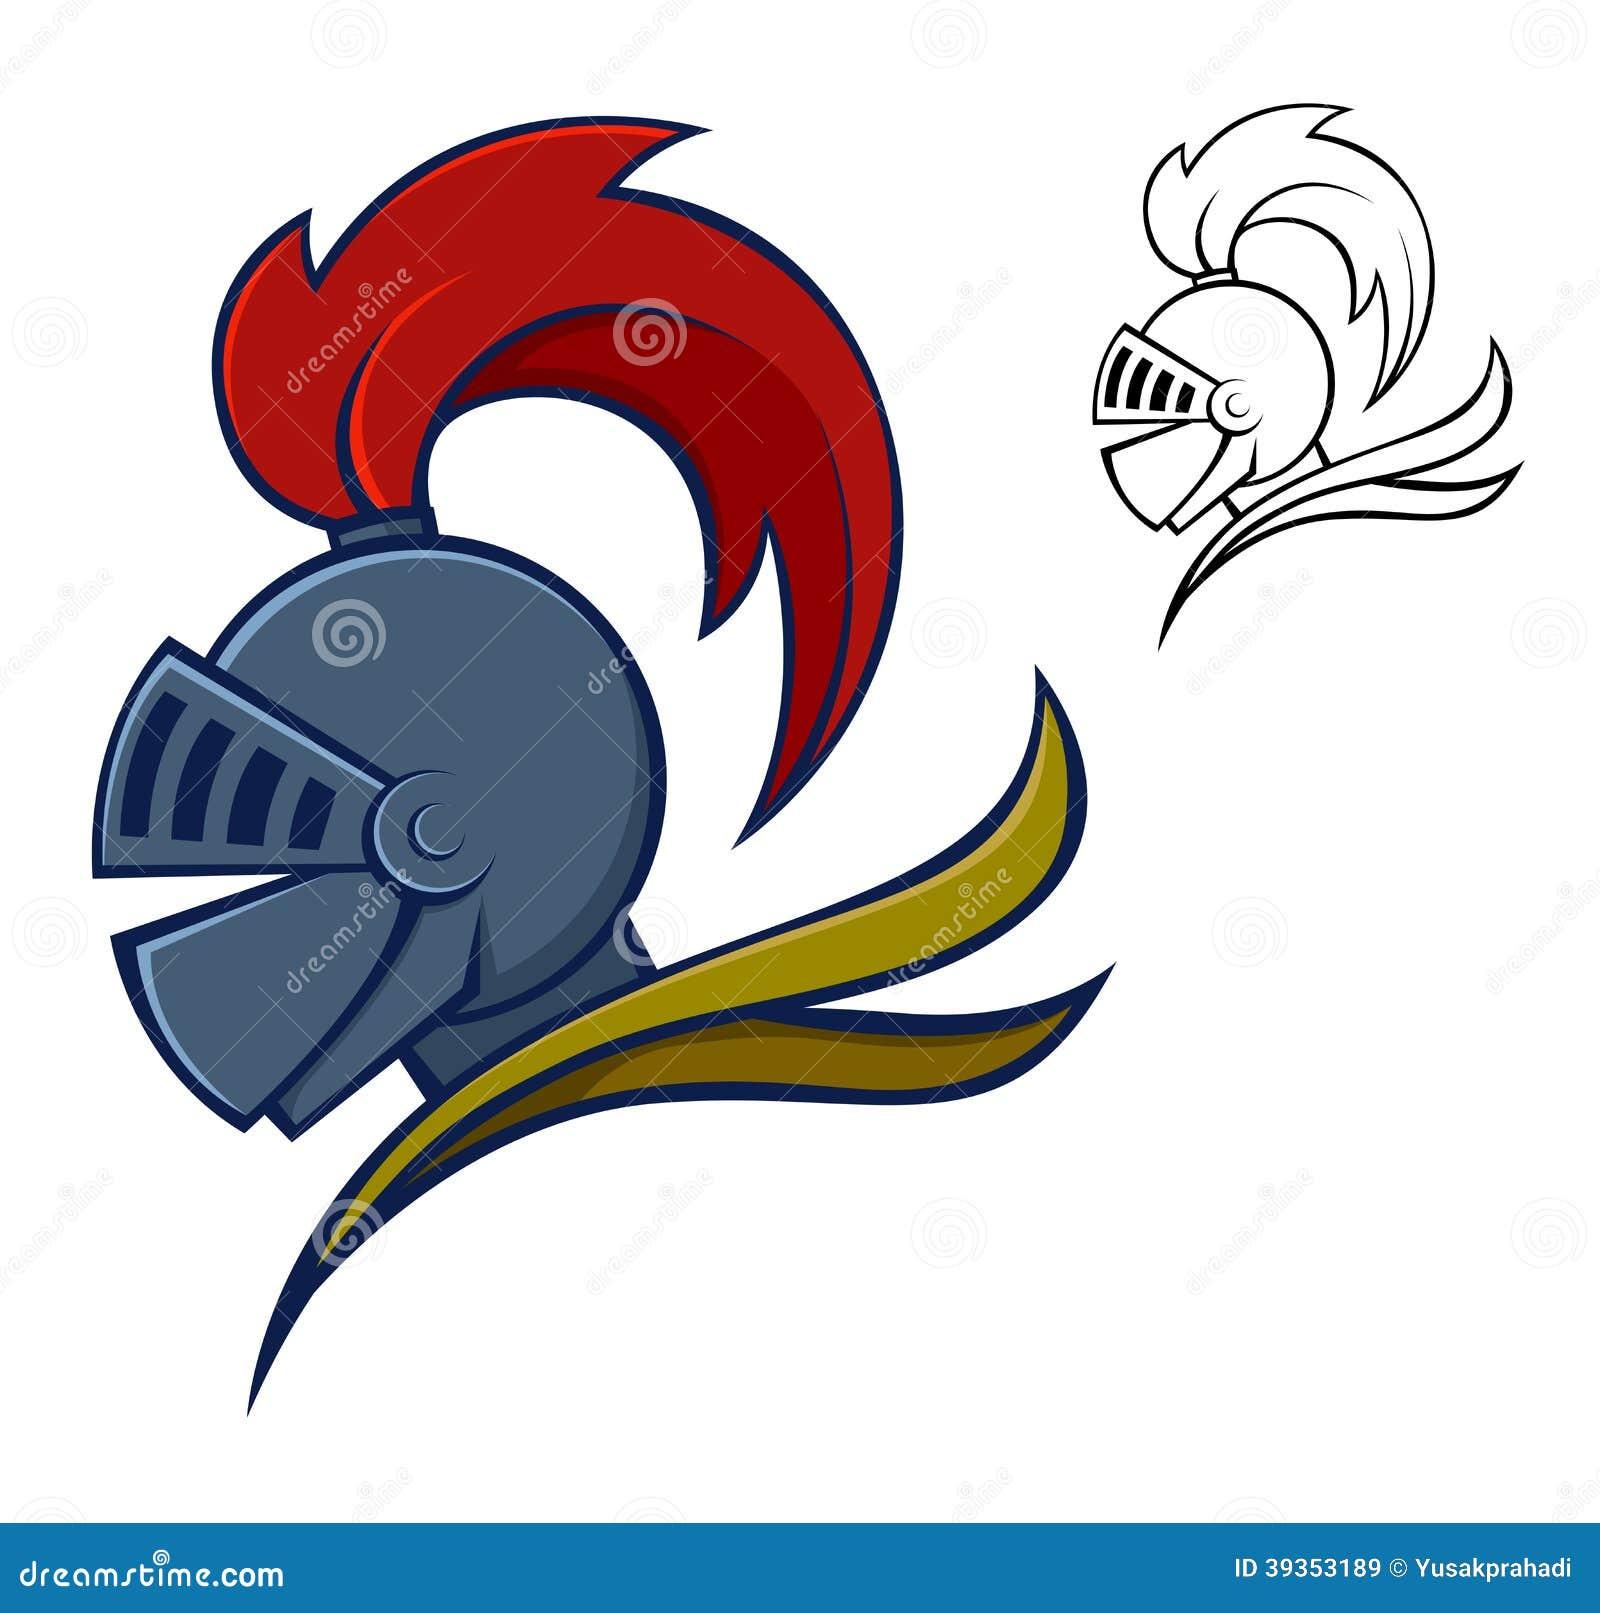 Medieval knight helmet stock vector illustration of protection medieval knight helmet biocorpaavc Choice Image